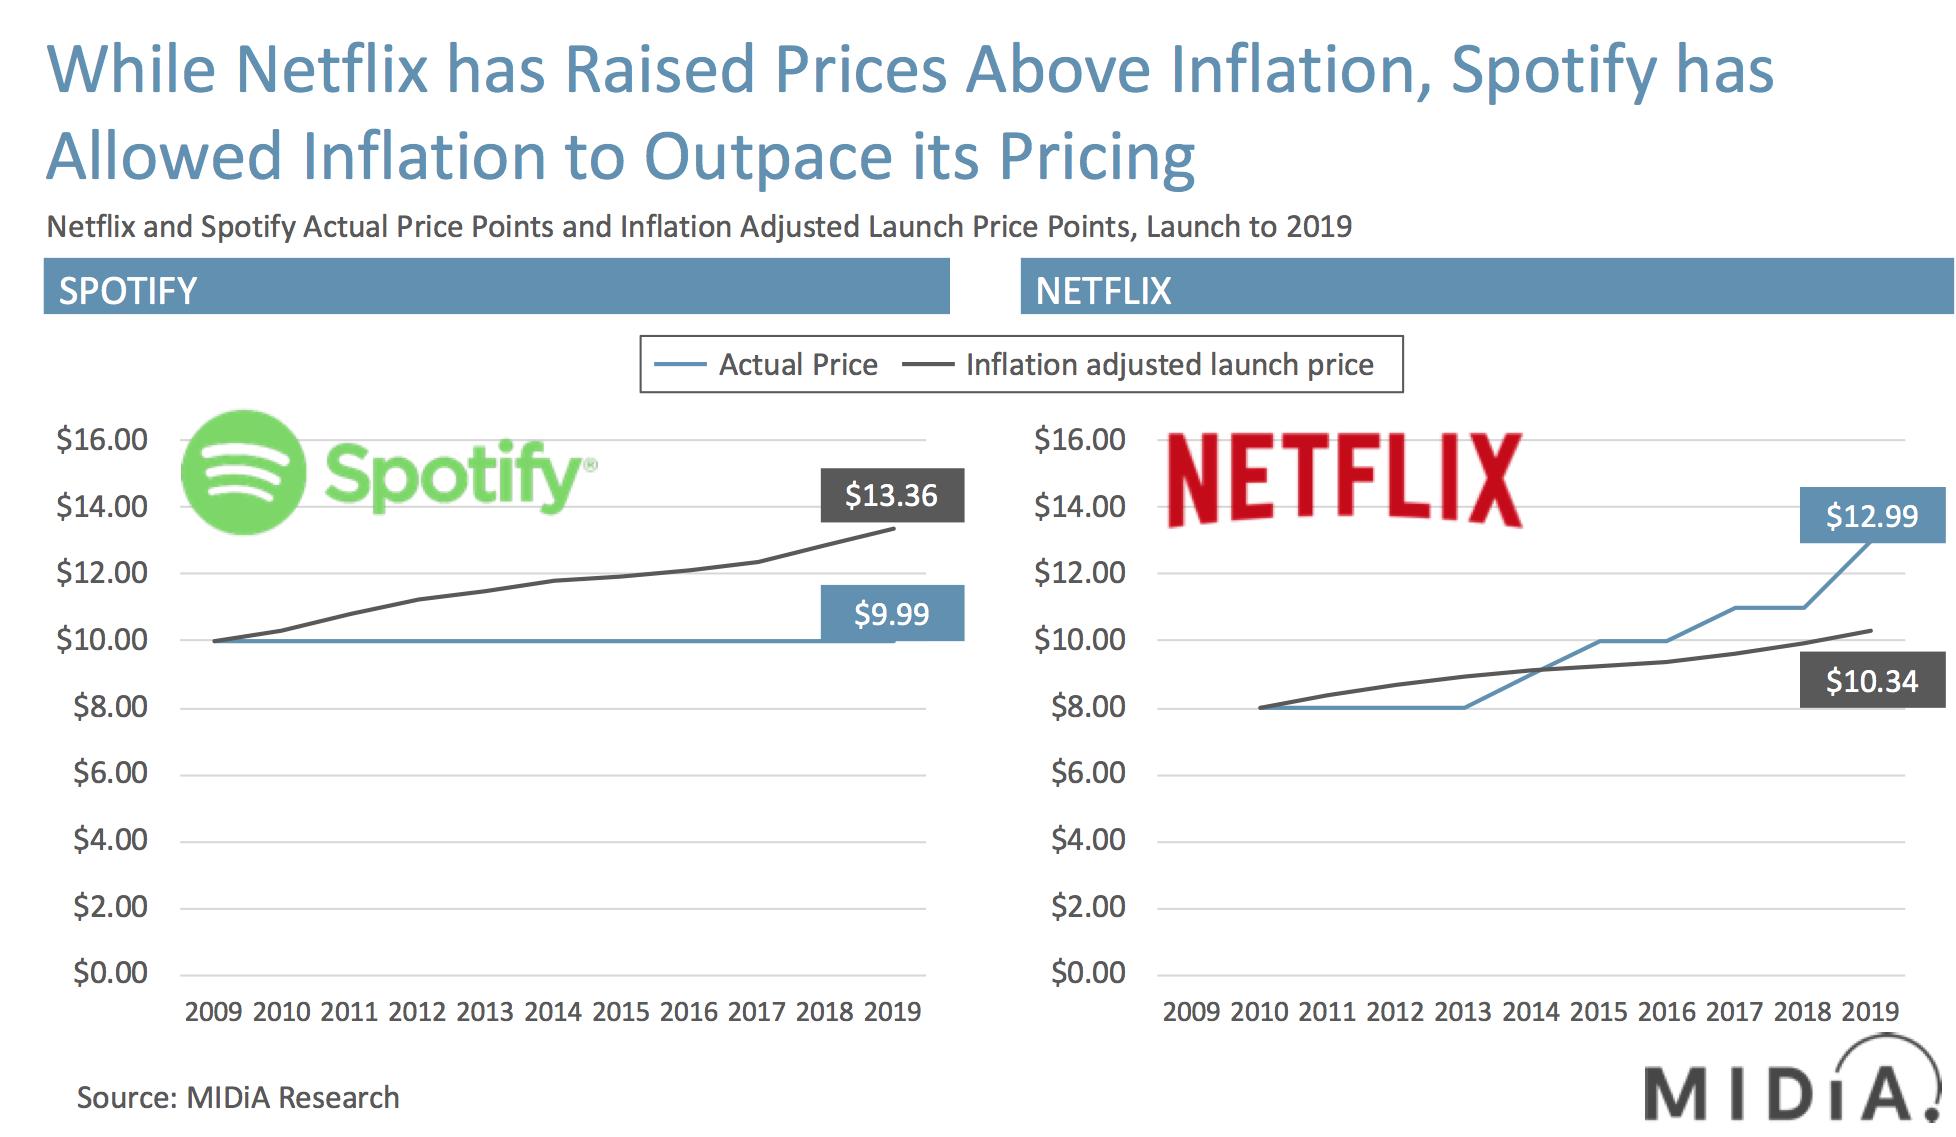 spotify netflix pricing inflation